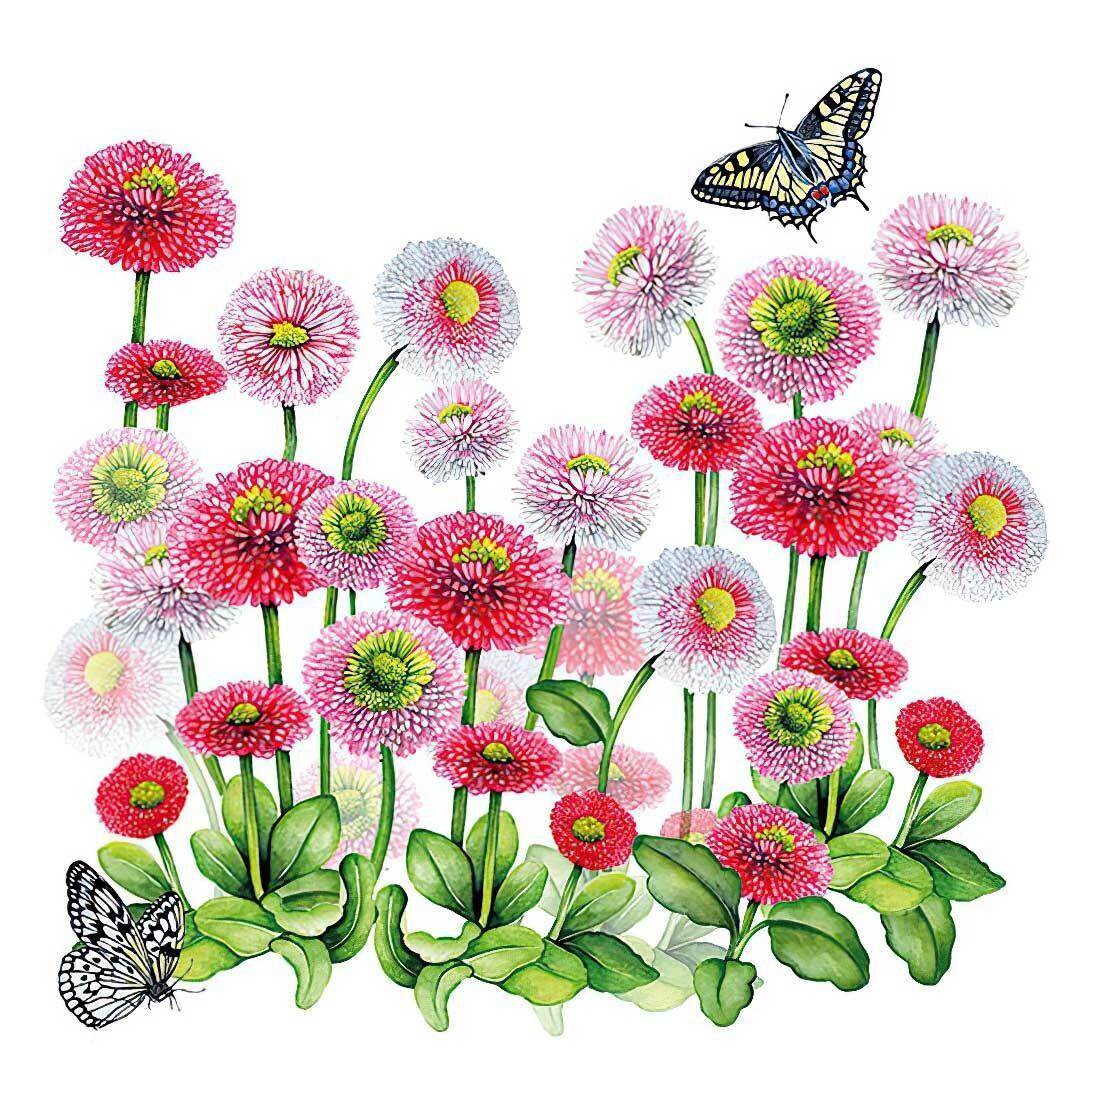 Decoupage Paper Napkins - Floral and Butterflies - Bellis (1 Sheet)